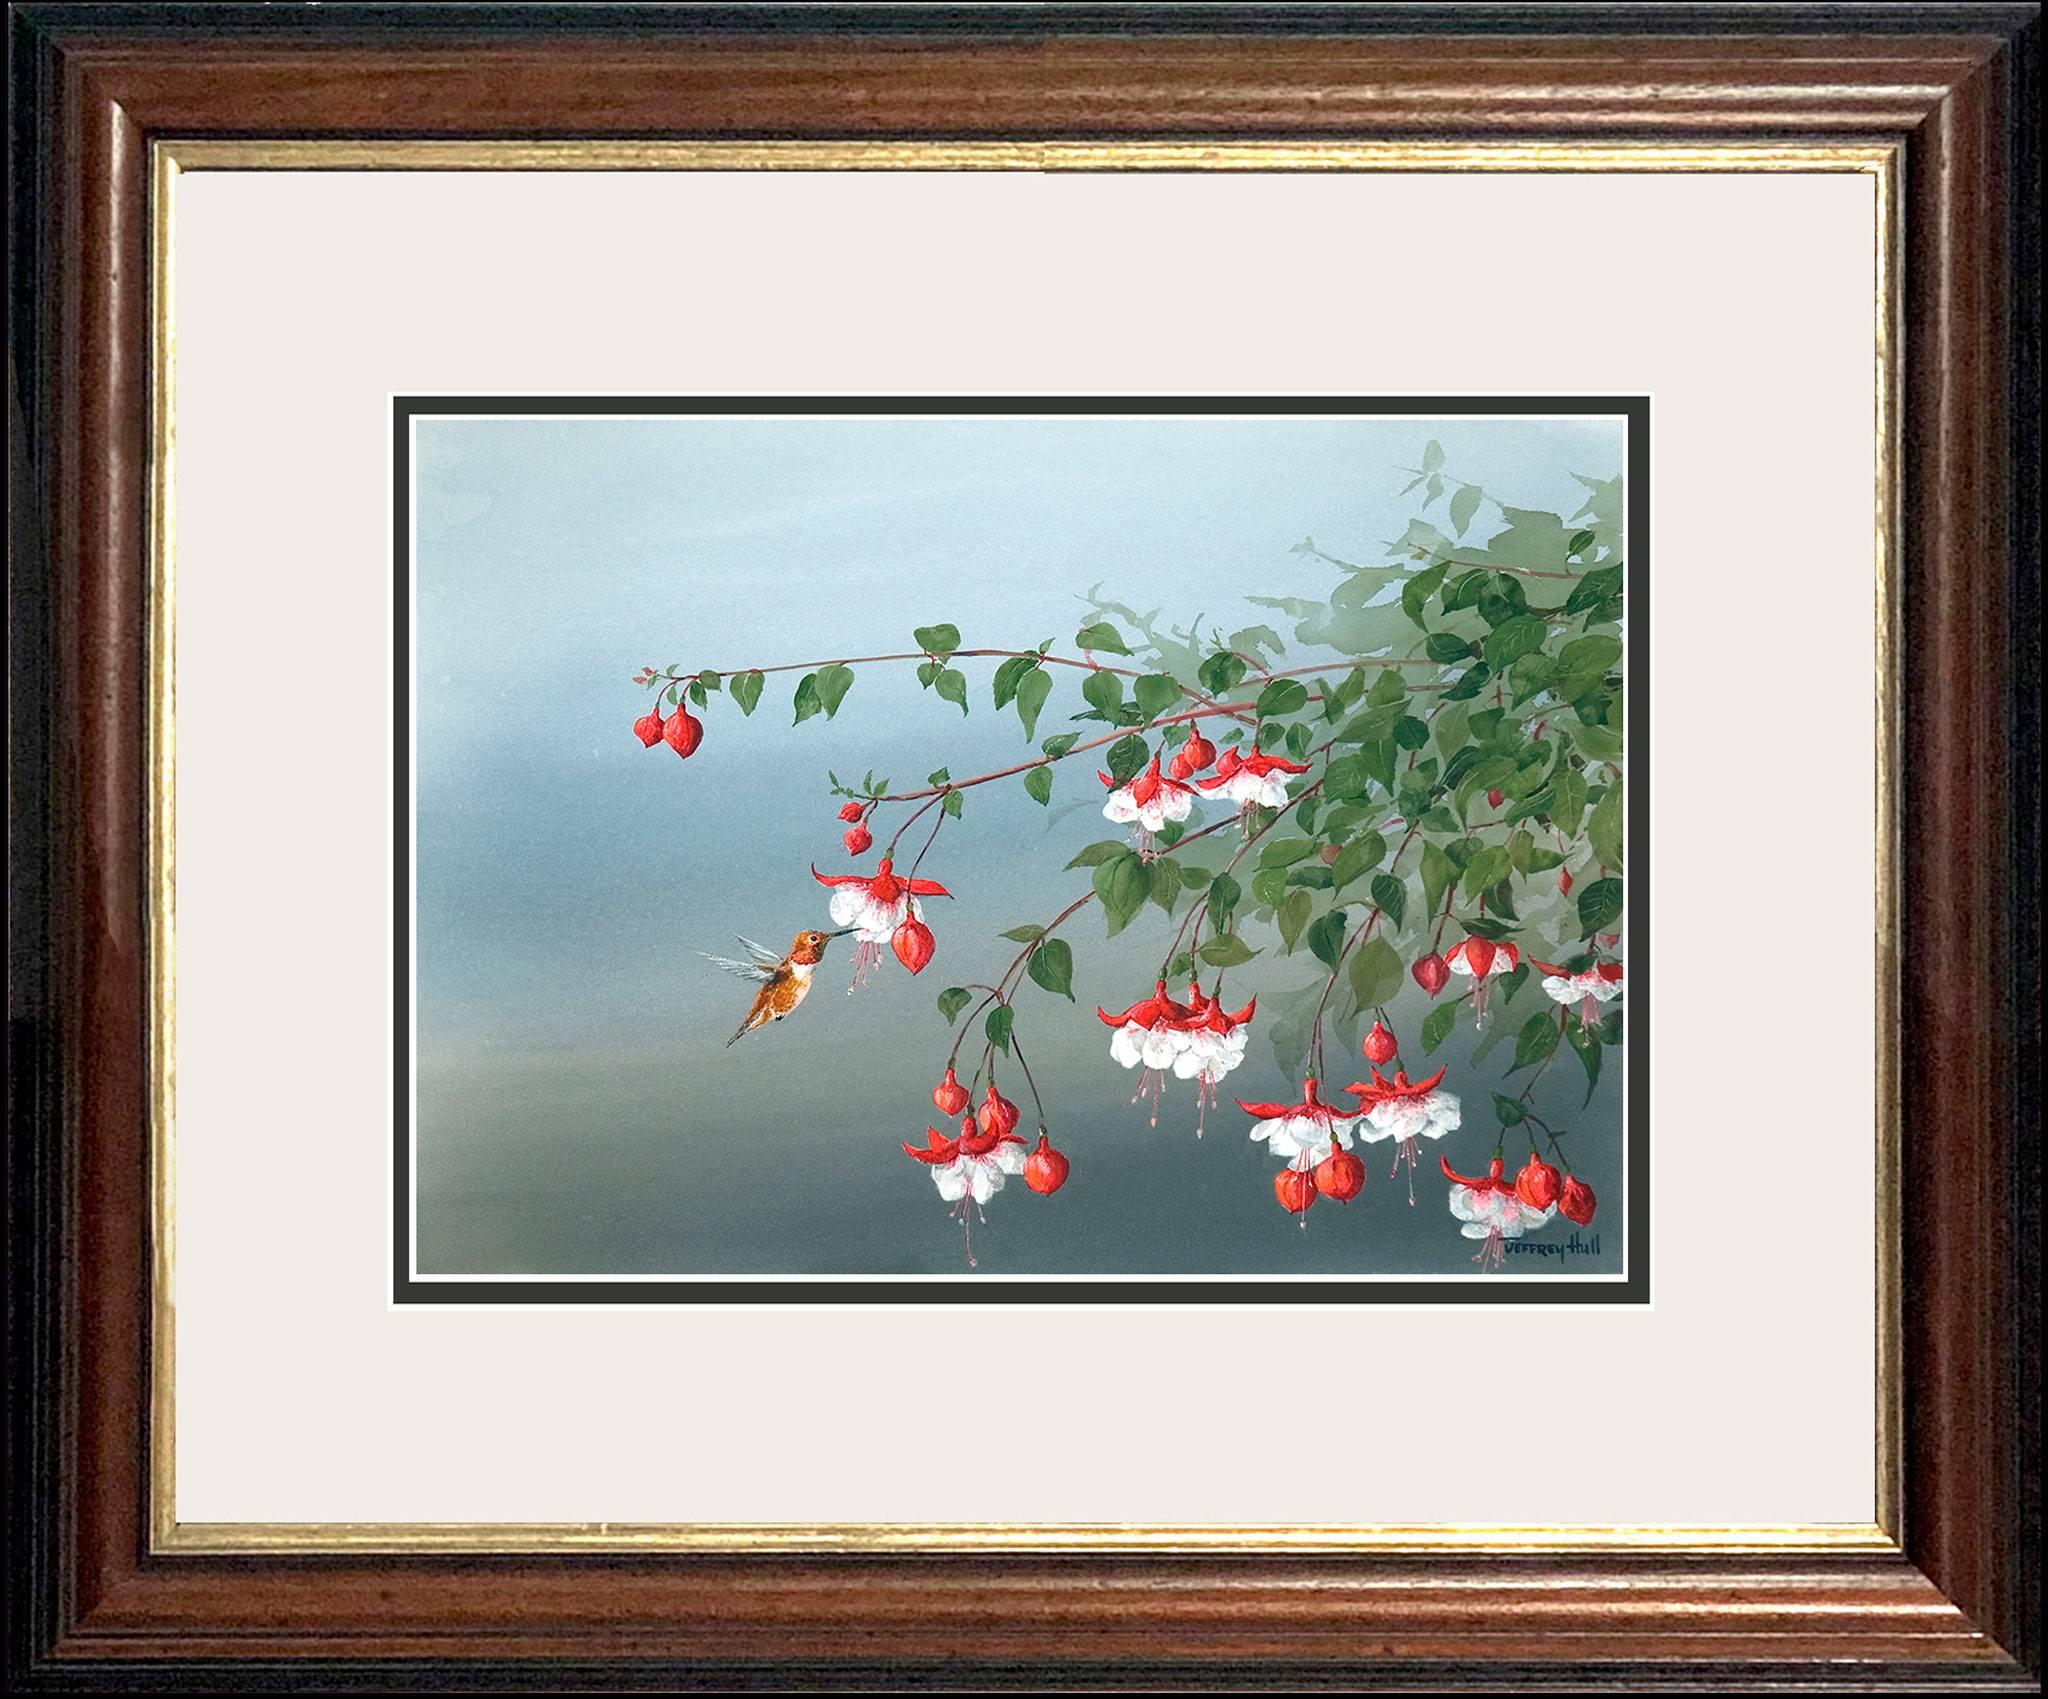 Fuchsia-Blossoms-OpenEd-Malabar-Talc-Dark-Shale-4-Website-2021